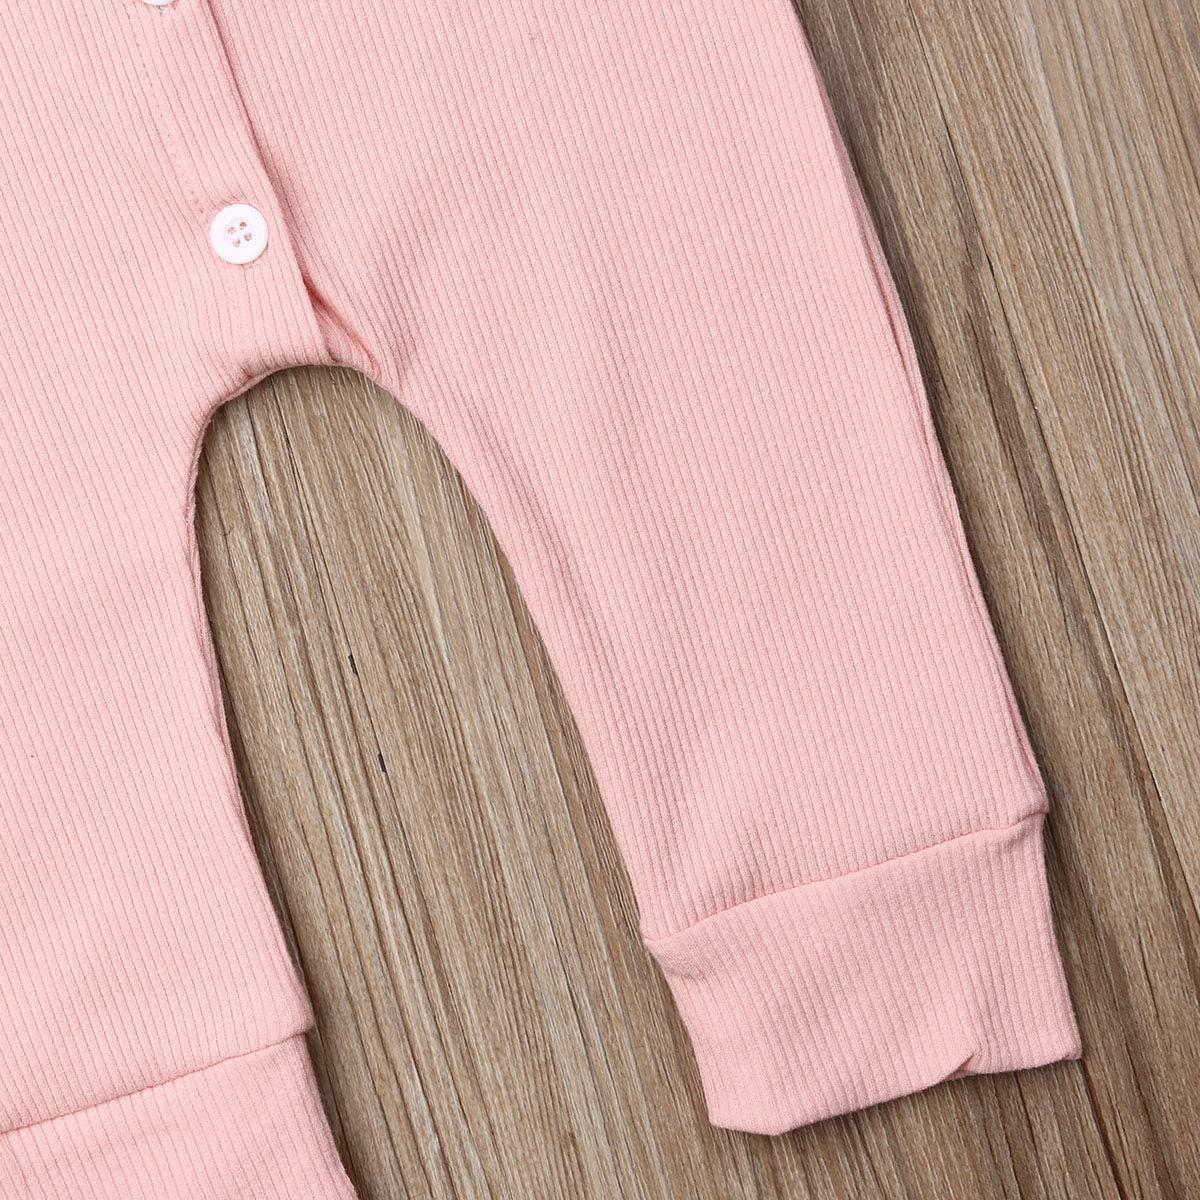 Newborn Infant Baby Girl Boy Long Sleeve Cotton Romper Sleepwear Jumpsuit One Piece Pajamas Footless Sleep and Play